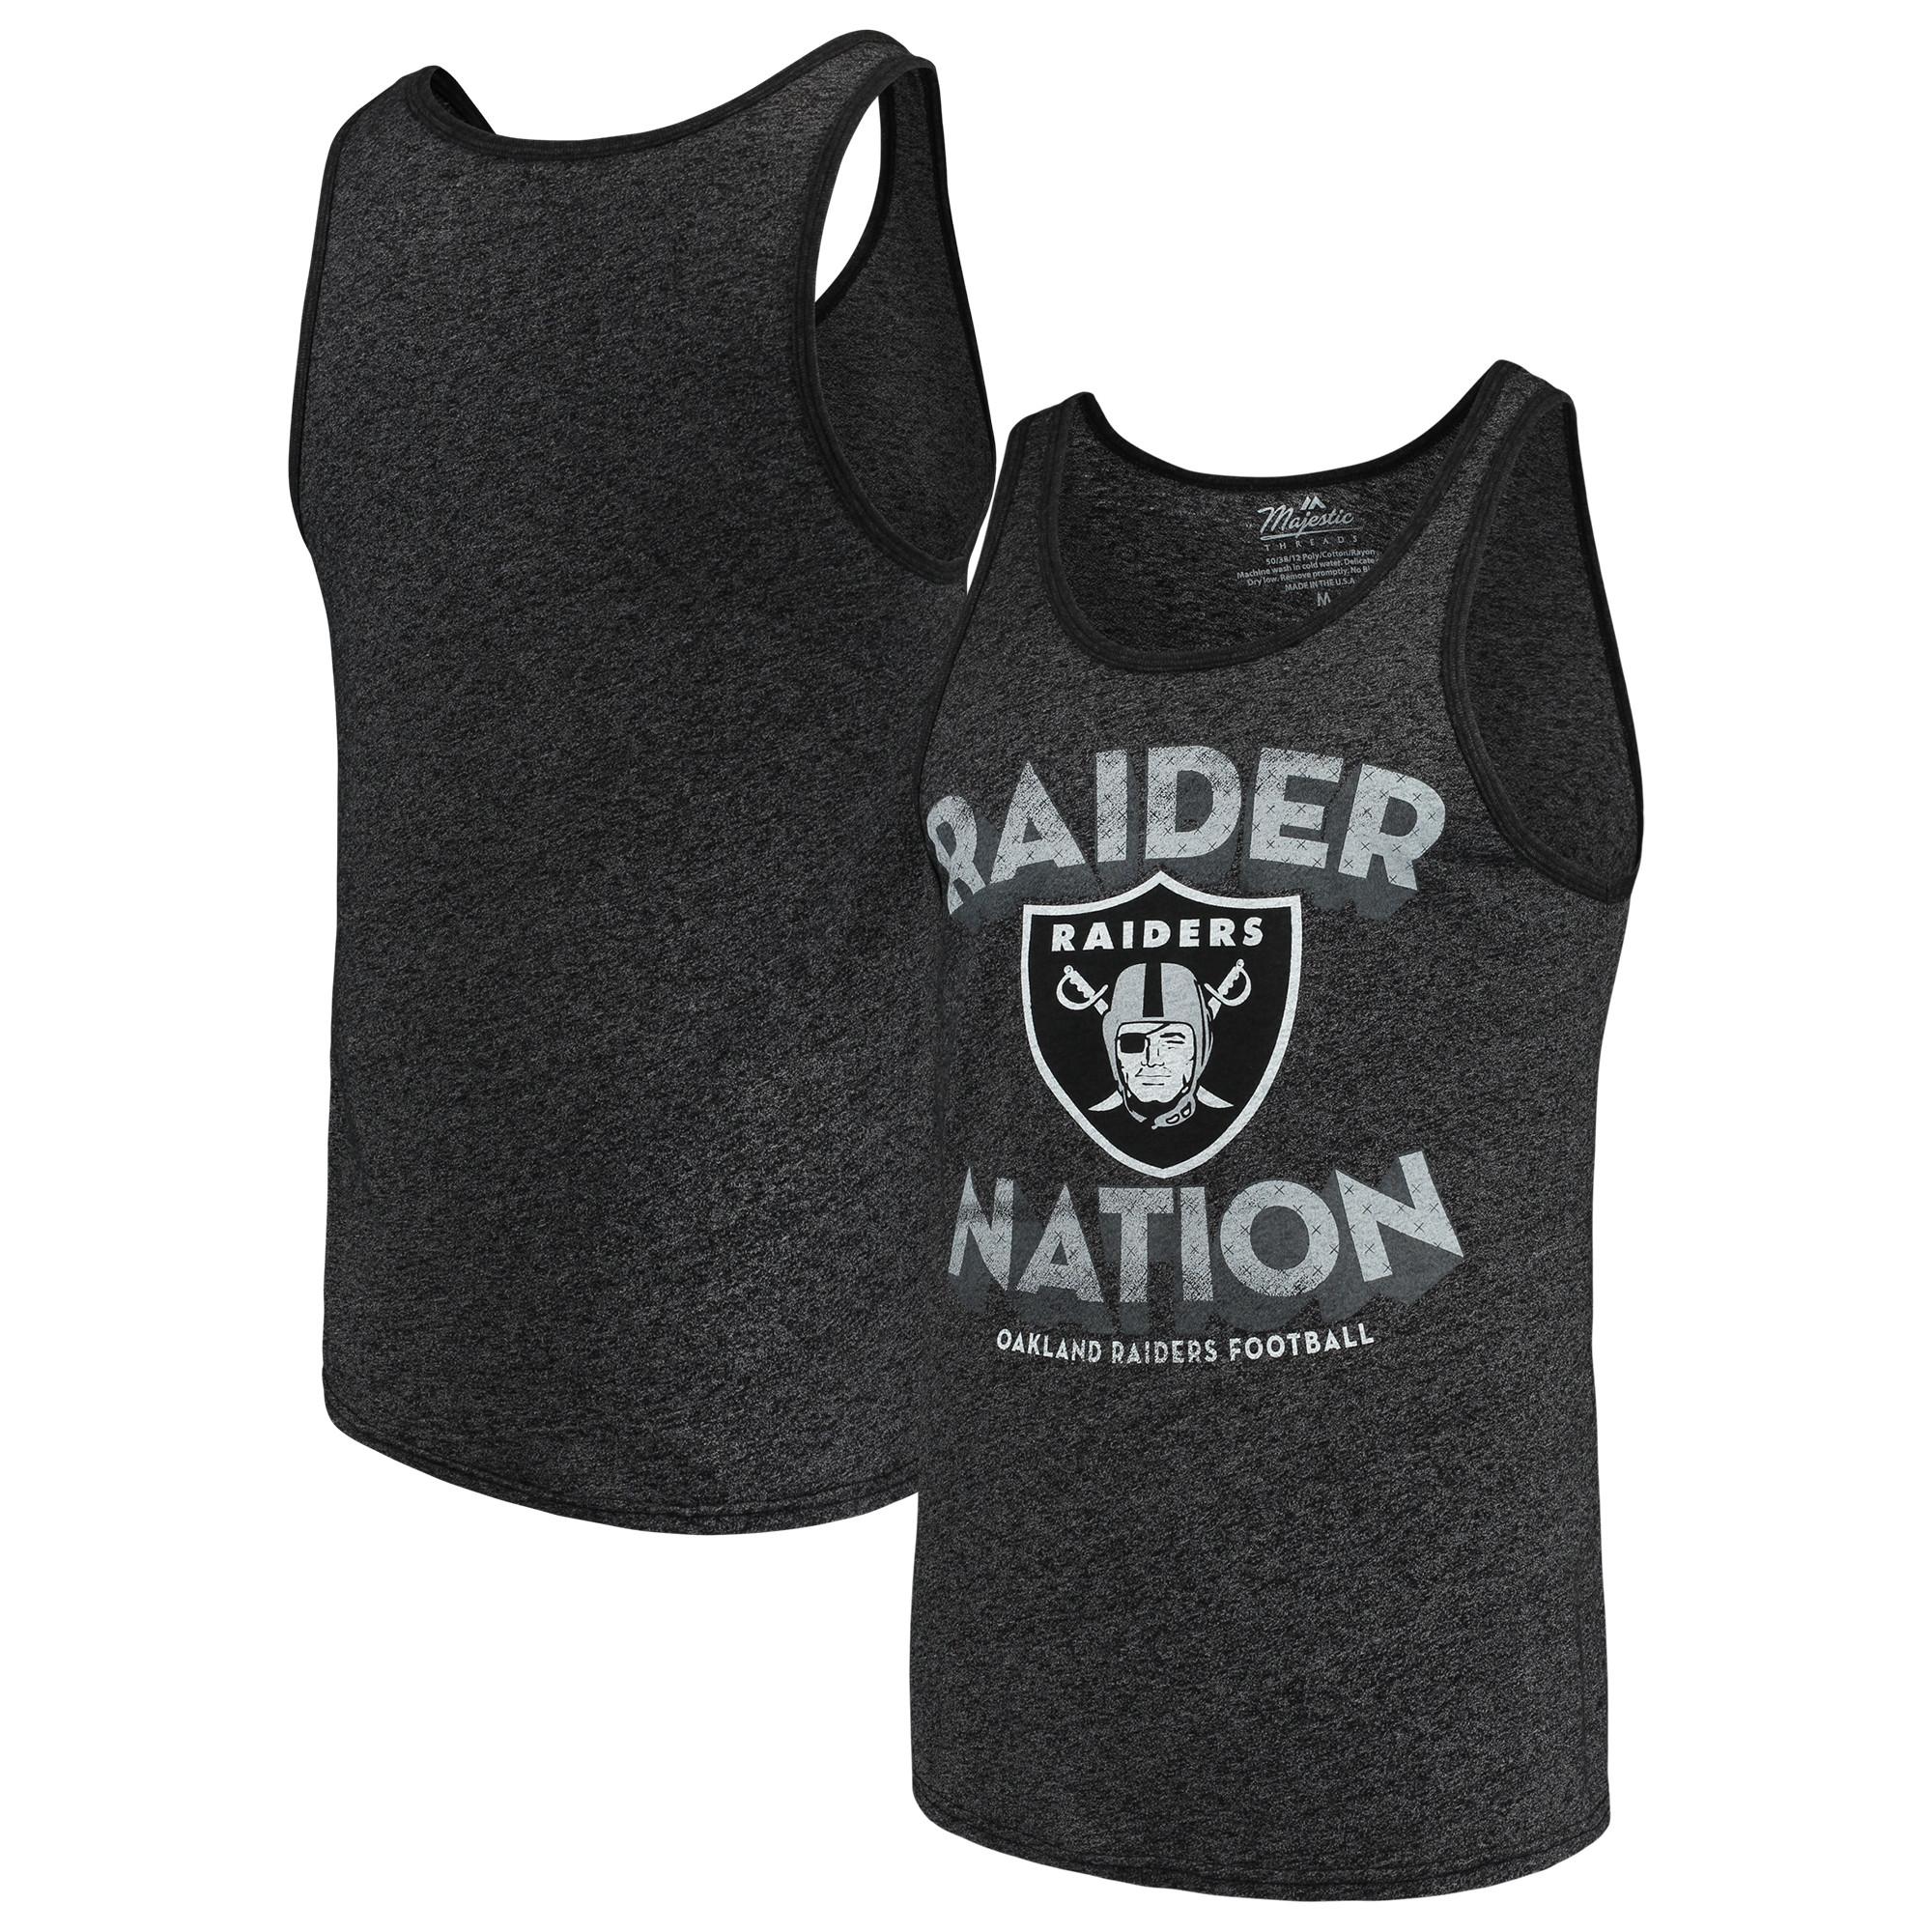 Oakland Raiders Majestic Threads Slogan Tri-Blend Tank Top - Black